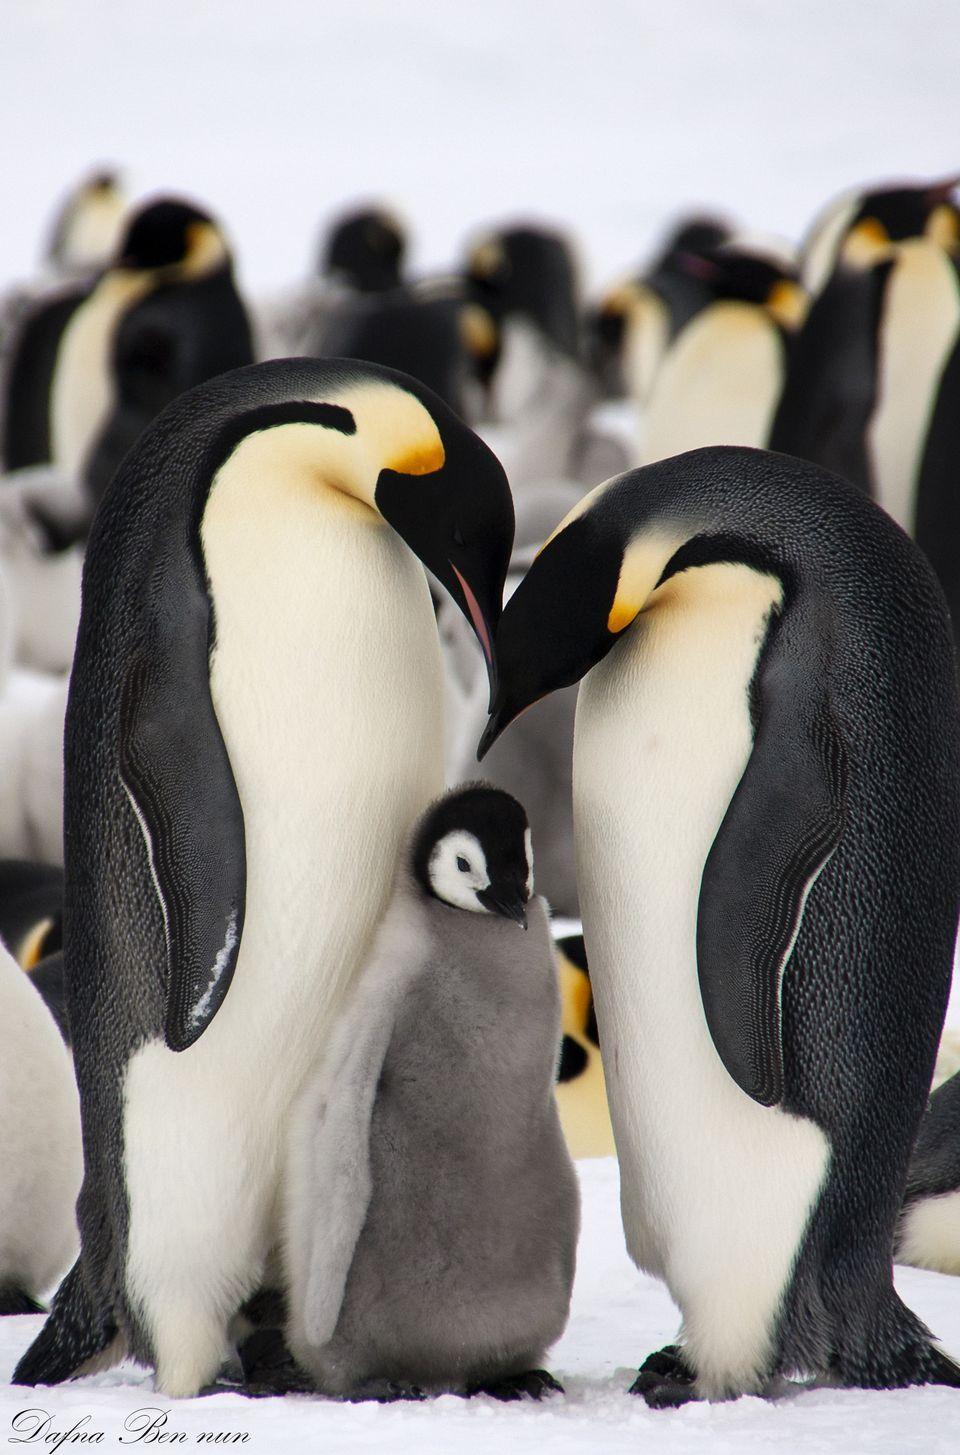 Emperor Penguin Backgrounds on Wallpapers Vista